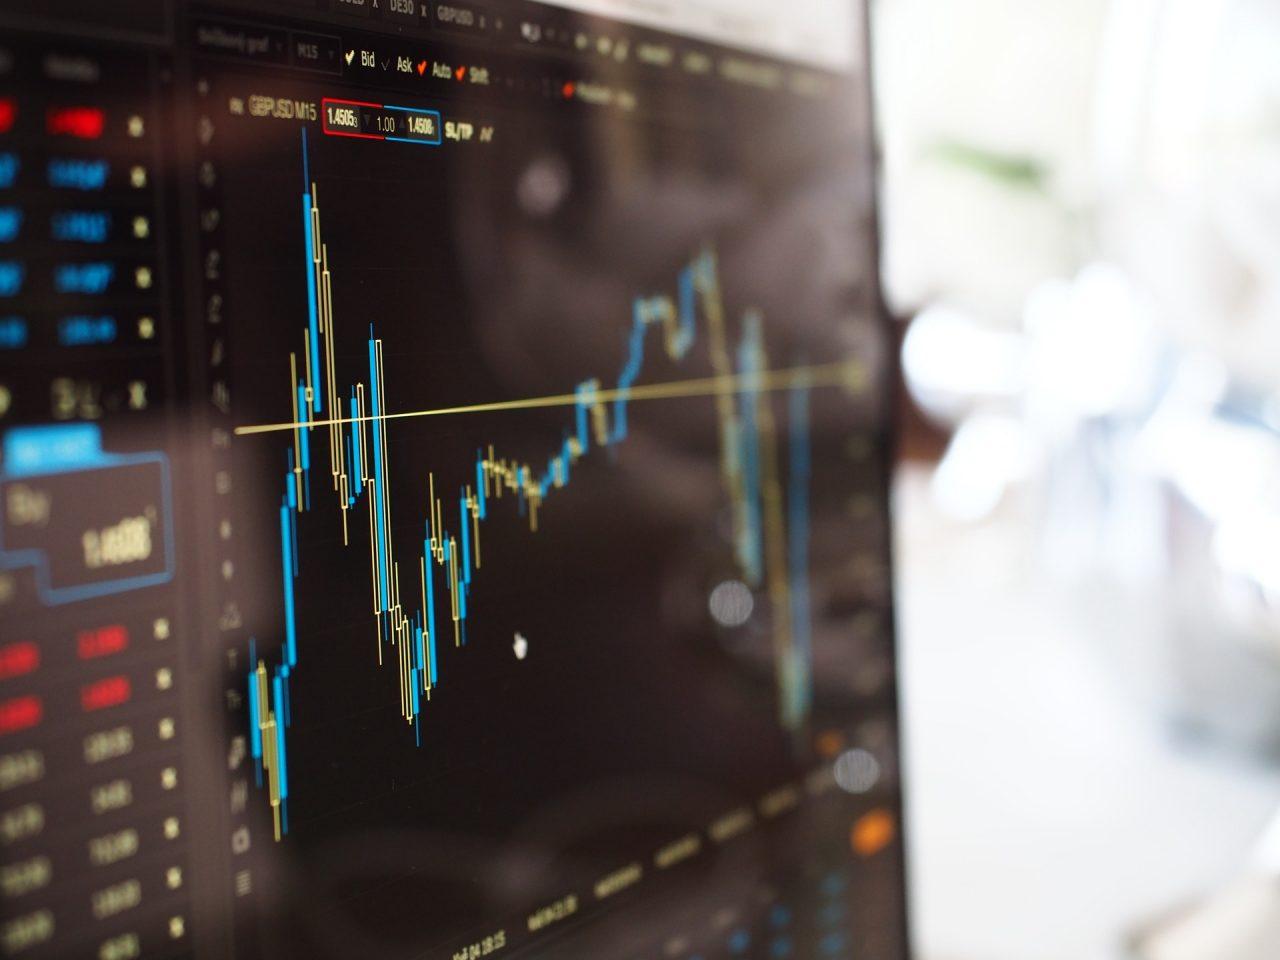 https://siekacz.pl/wp-content/uploads/2020/06/blue-and-yellow-graph-on-stock-market-monitor-159888-1280x960.jpg